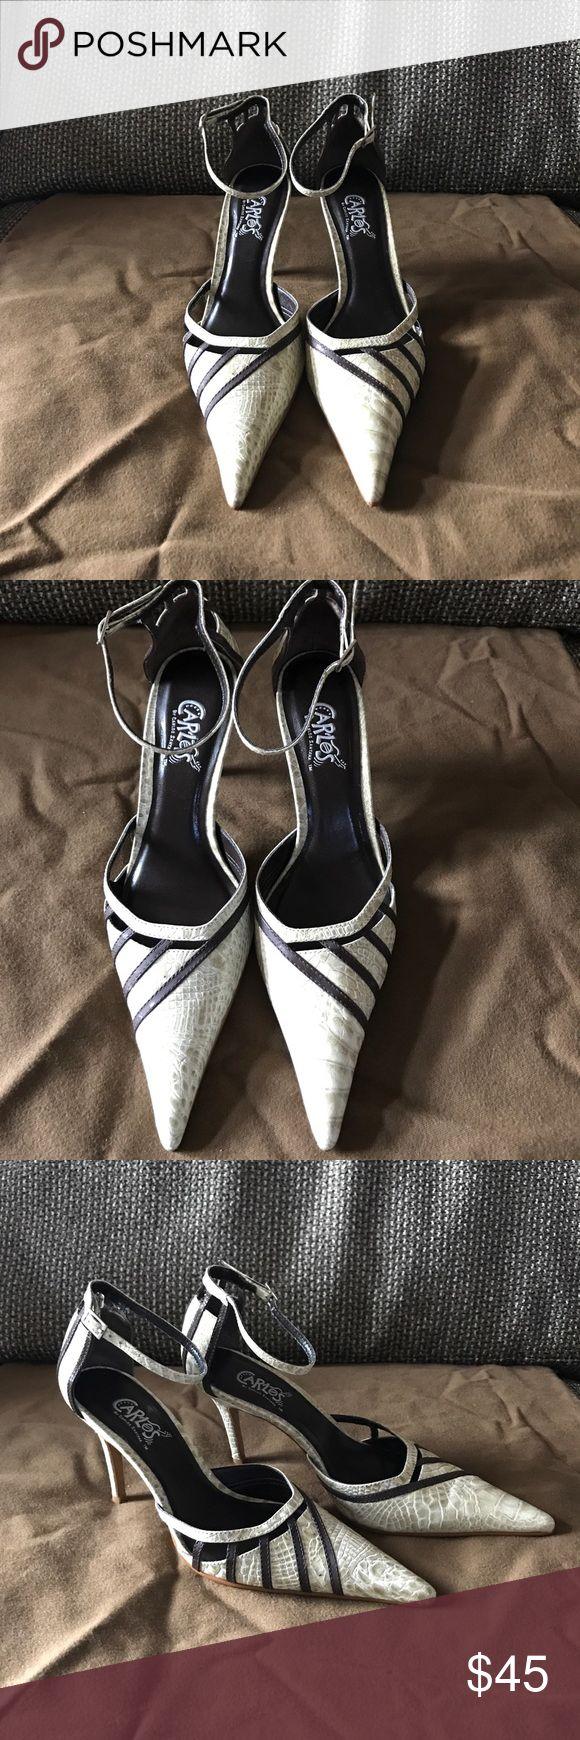 "Carlos by Carlos Santana Really cute heel. Buckle around ankle, 3""-3.5"" heel, shoe size 7.5. Tan with brown stripes. No box.  Slightly worn great condition Carlos Santana Shoes Heels"